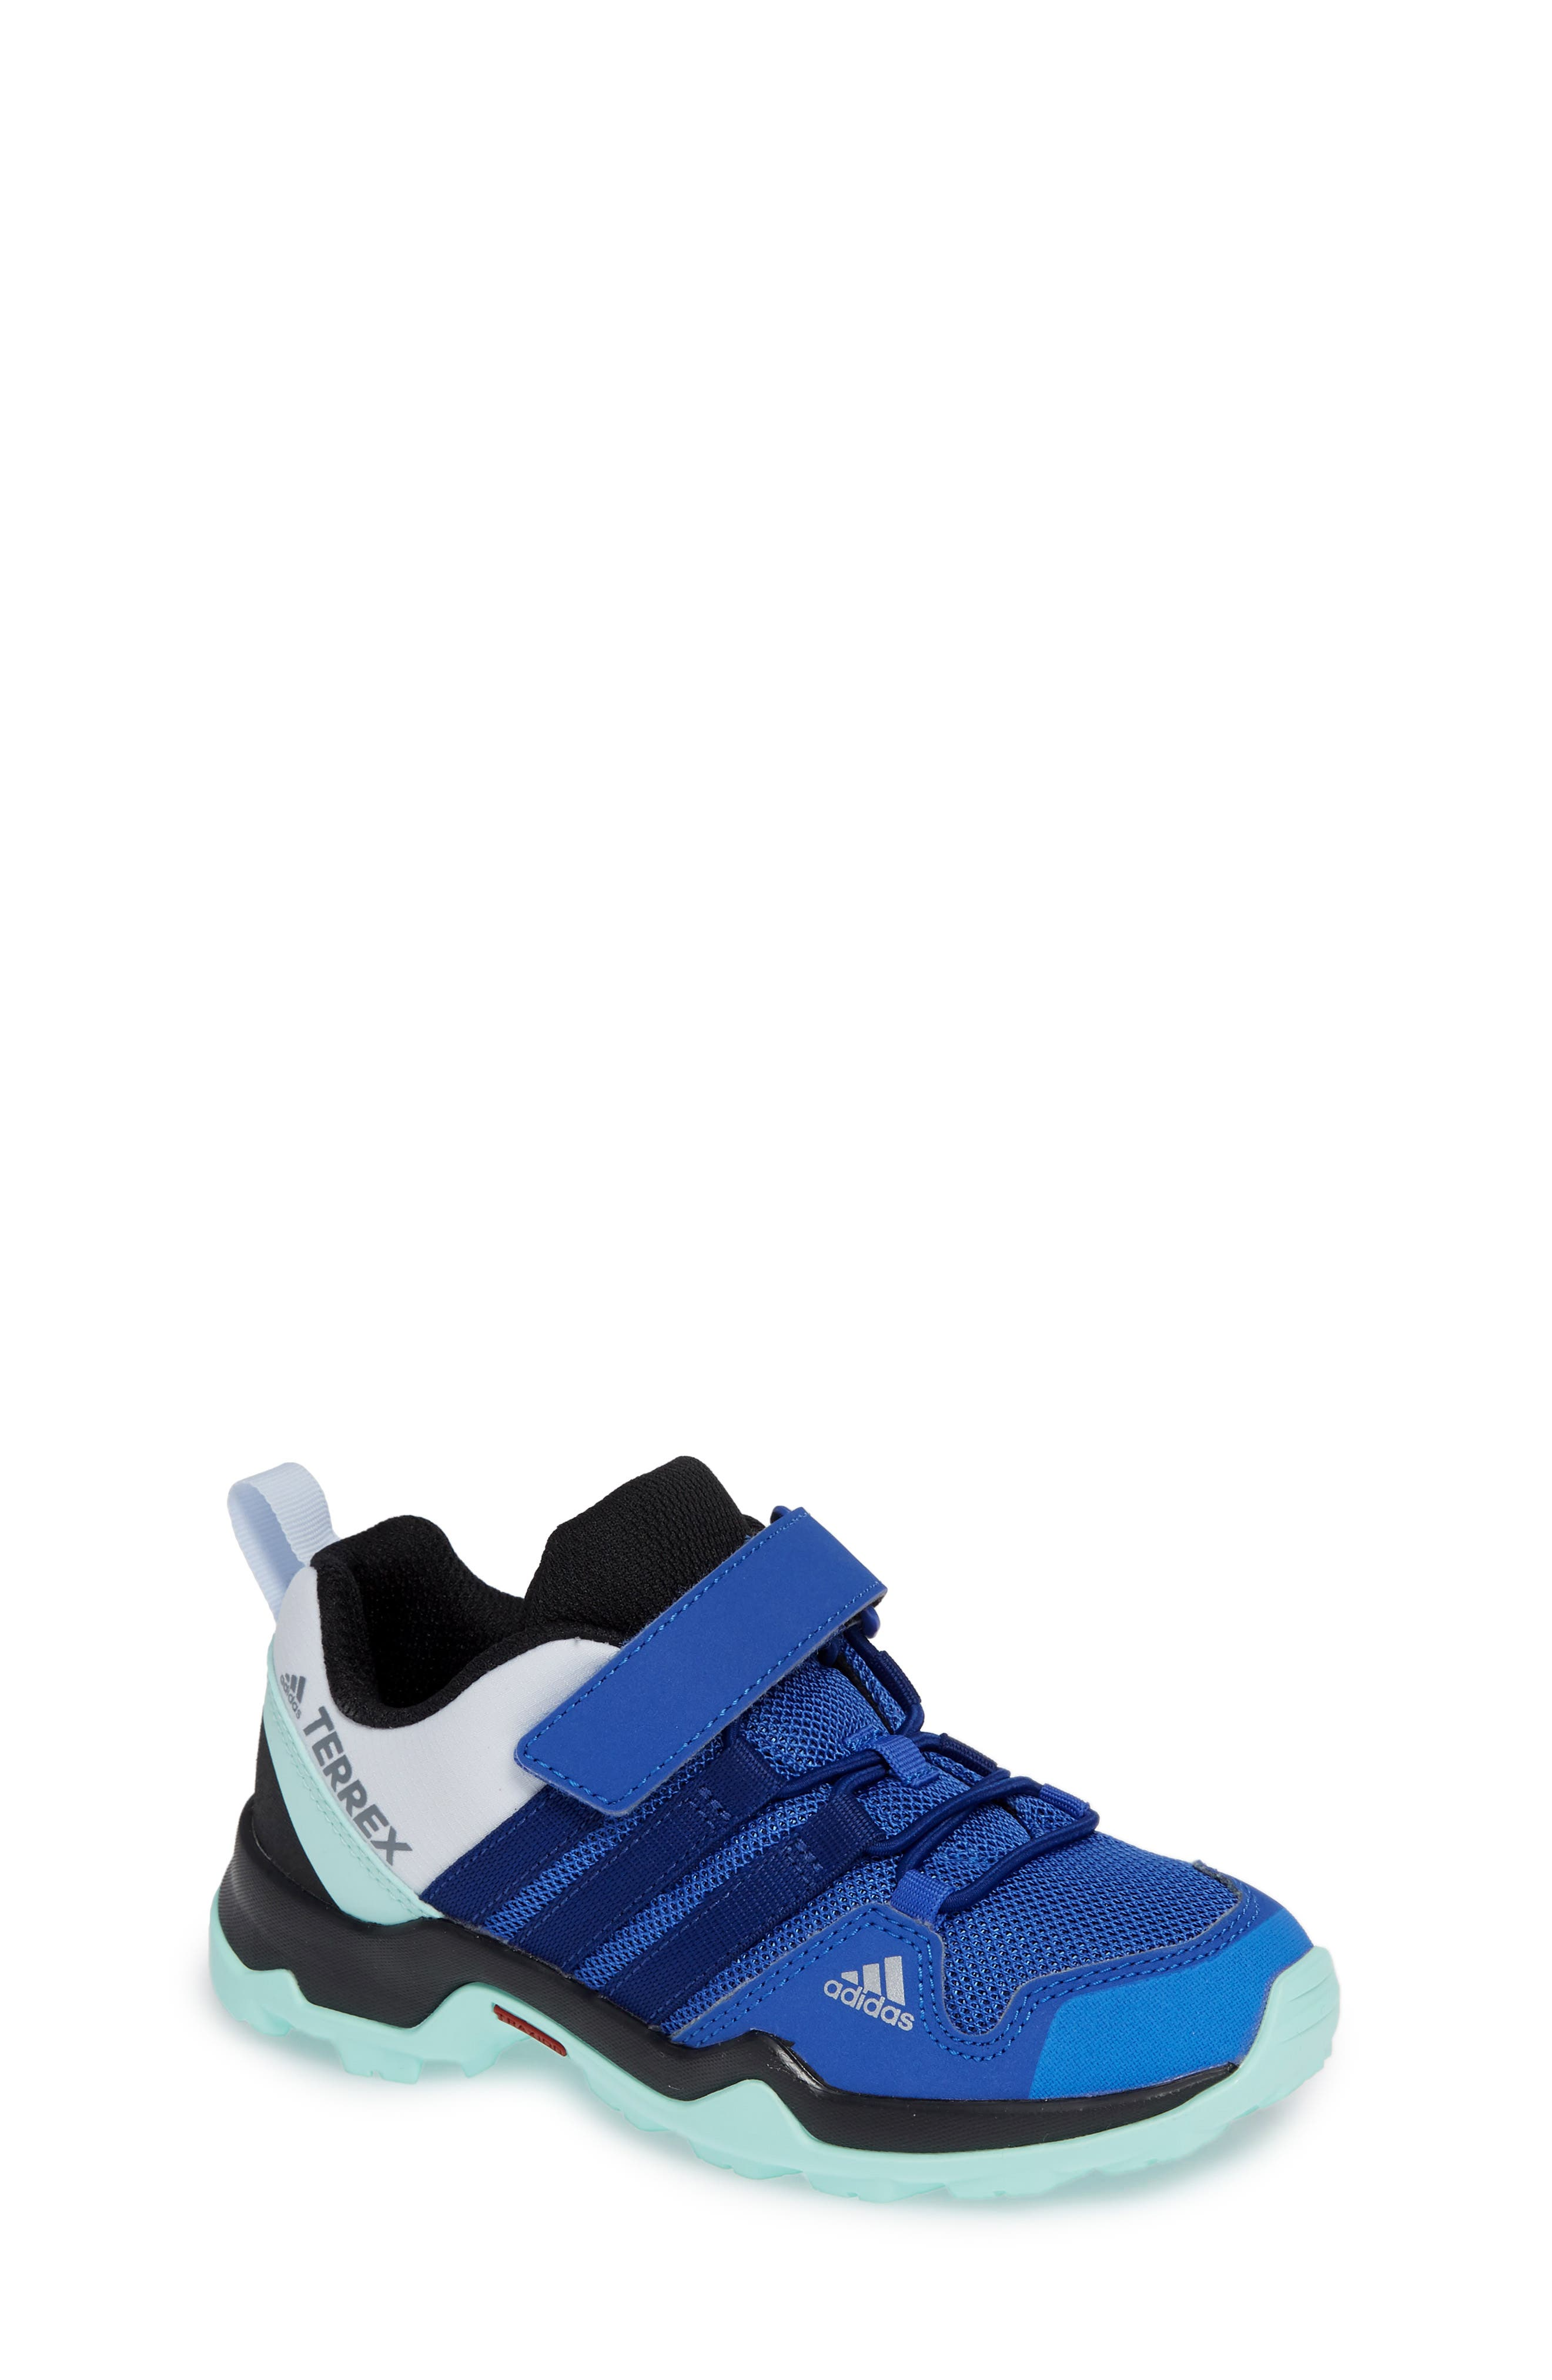 Terrex AX2R Sneaker,                         Main,                         color, HI-RES BLUE/ MYSTERY INK/ MINT